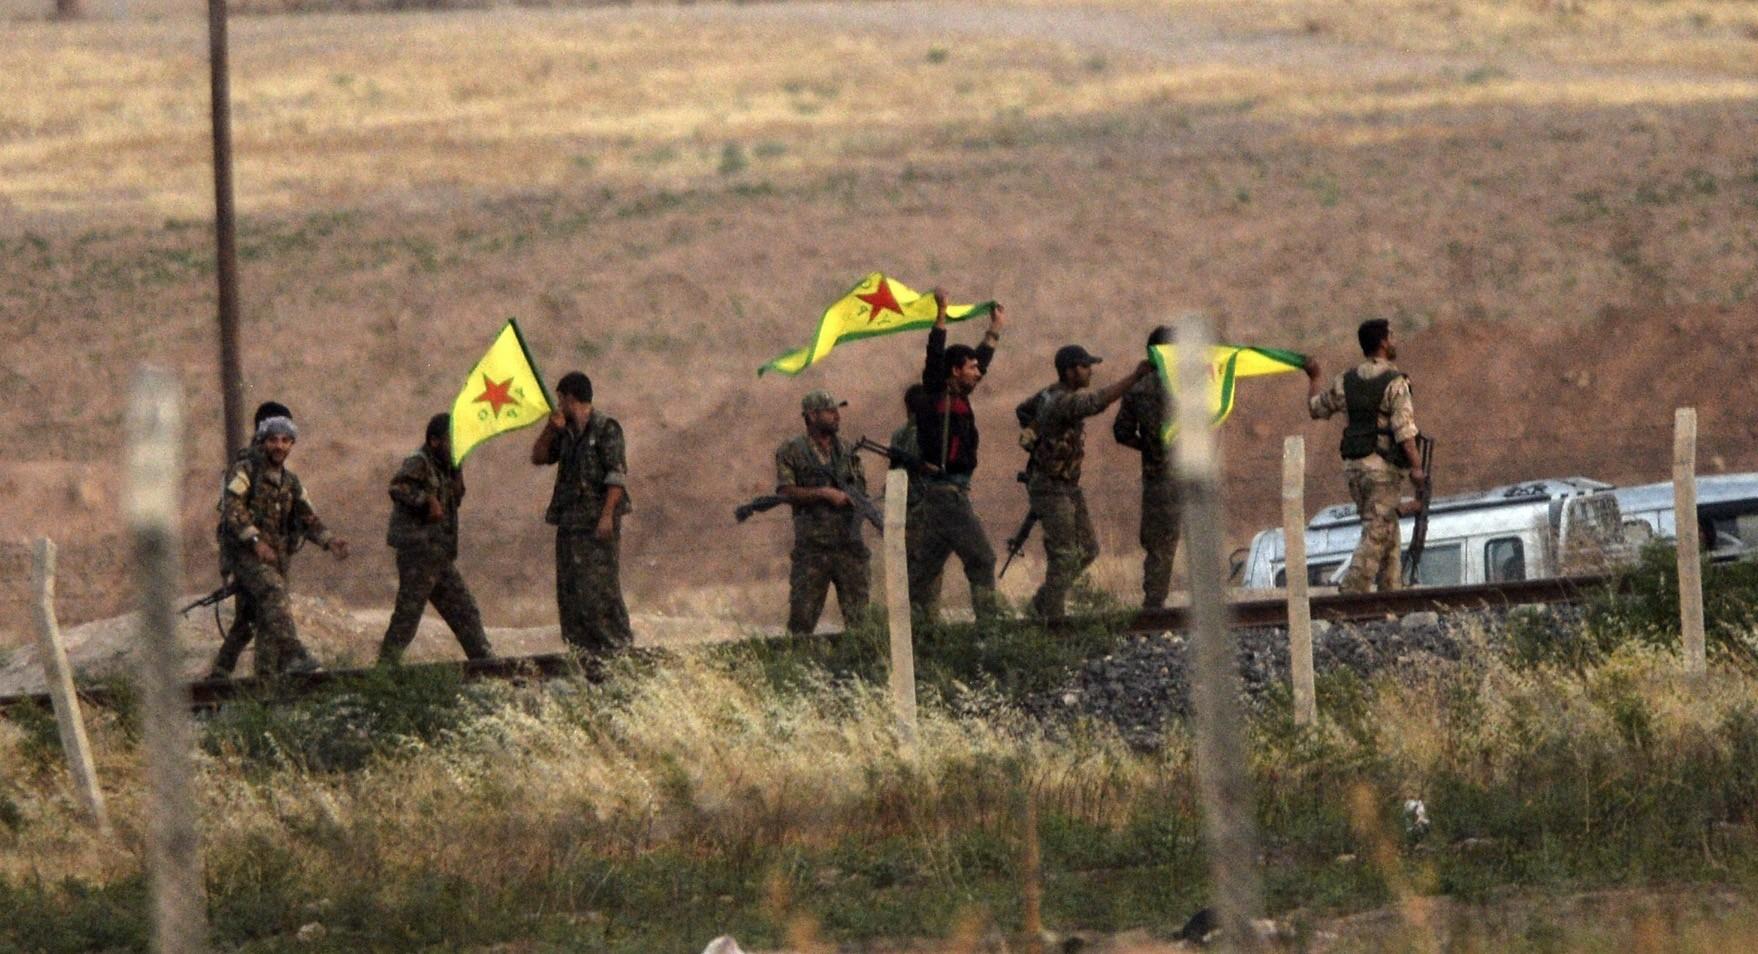 YPG terrorists hold flags near the Aku00e7akale border gate between Turkey and Syria, u015eanlu0131urfa, June 15, 2015.